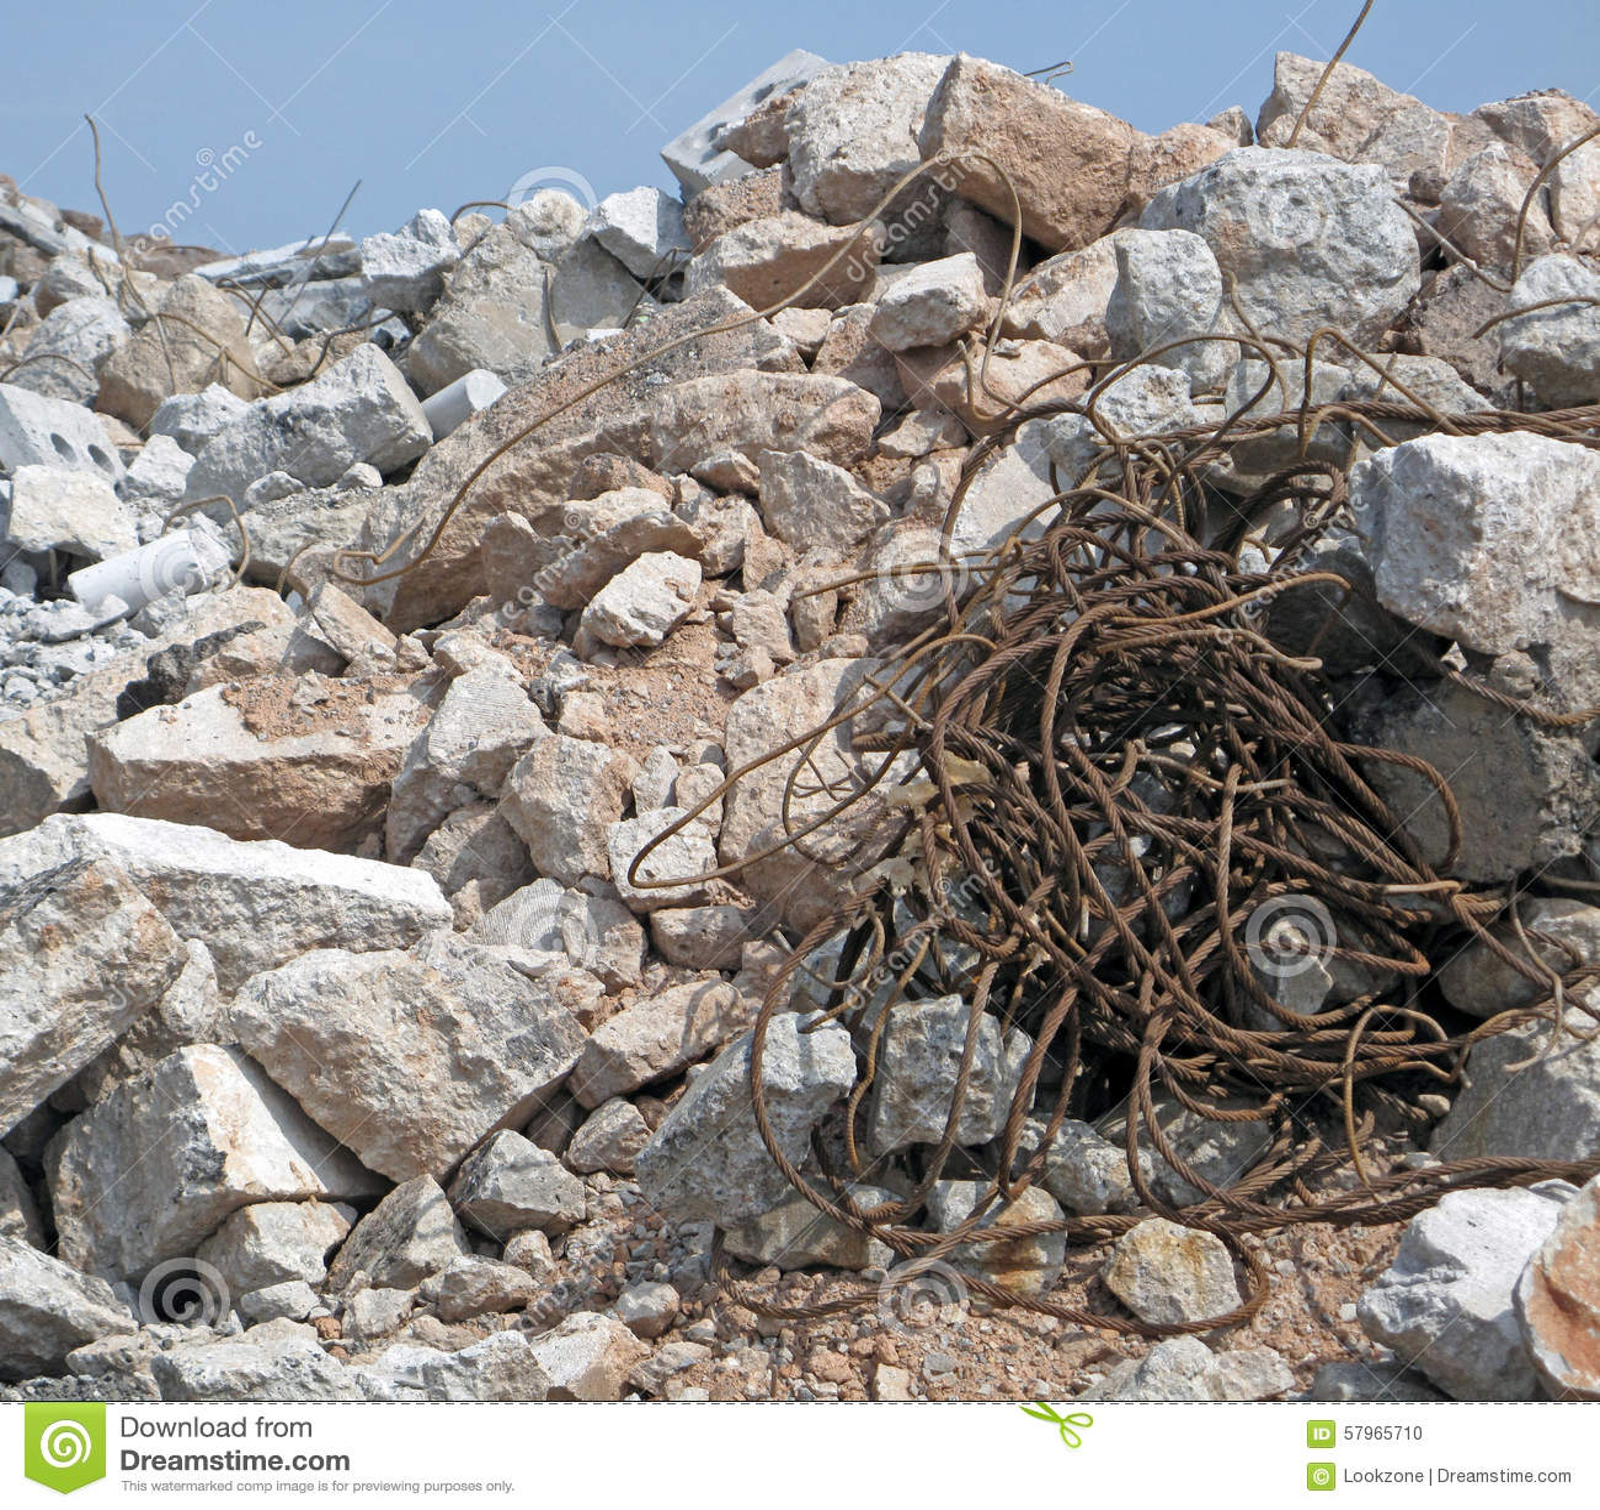 Pile Of Building Debris : Construction rubble stock photo image of fragments